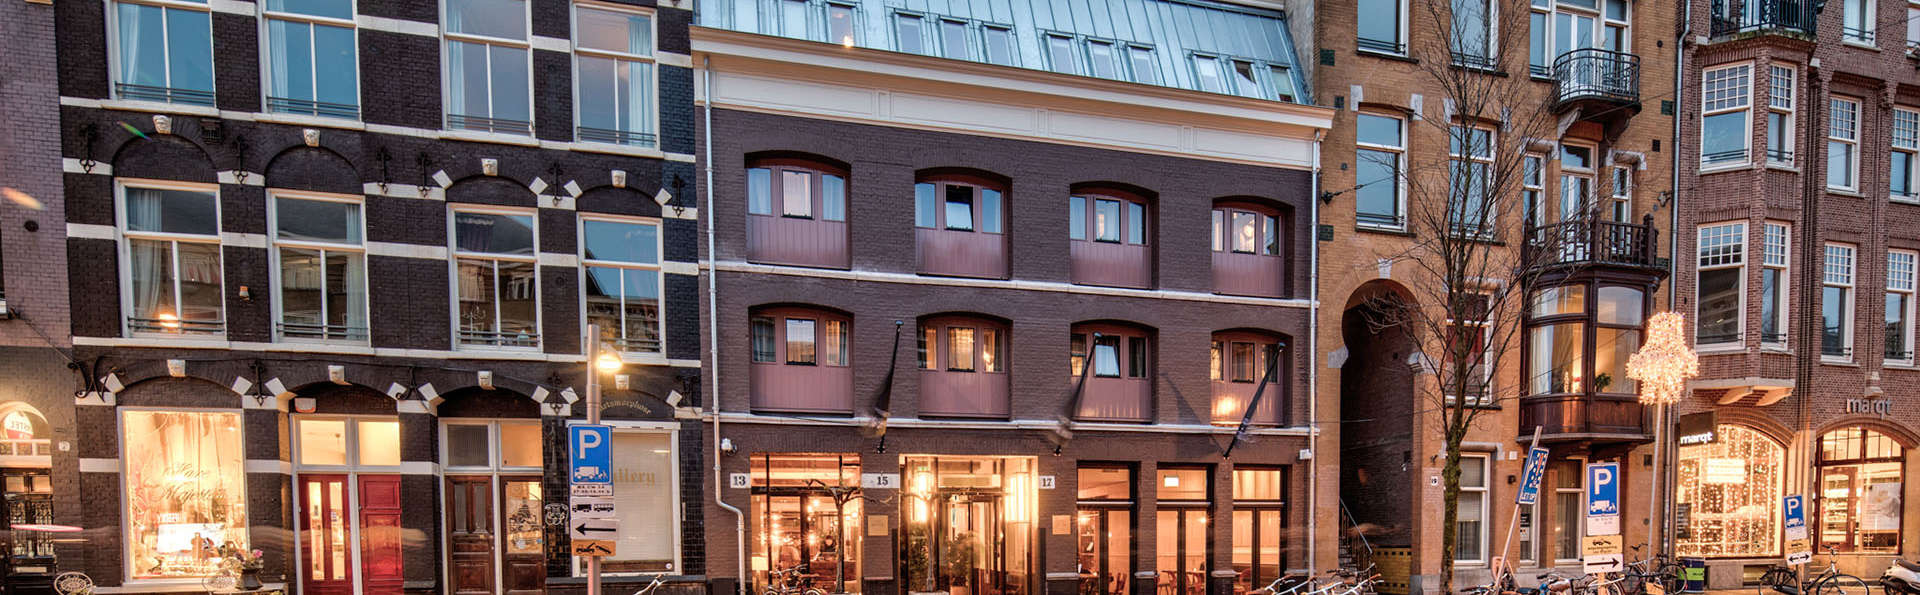 Hotel Van De Vijsel - EDIT_LucasKemper_Vondel_Vijsel_Outside_LR-12.jpg